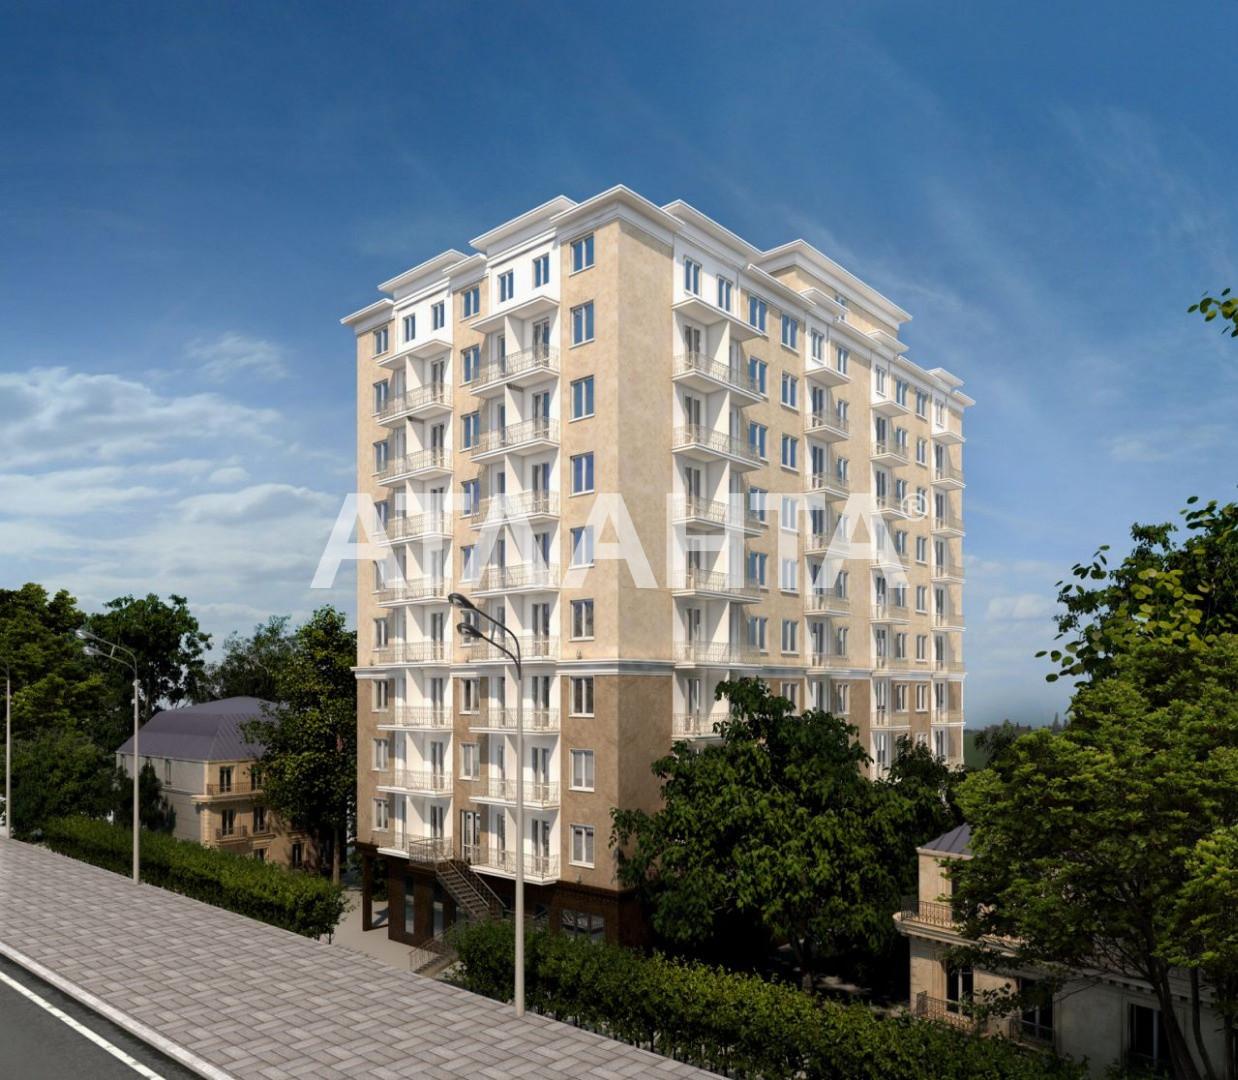 Продается 1-комнатная Квартира на ул. Балковская (Фрунзе) — 24 150 у.е. (фото №3)